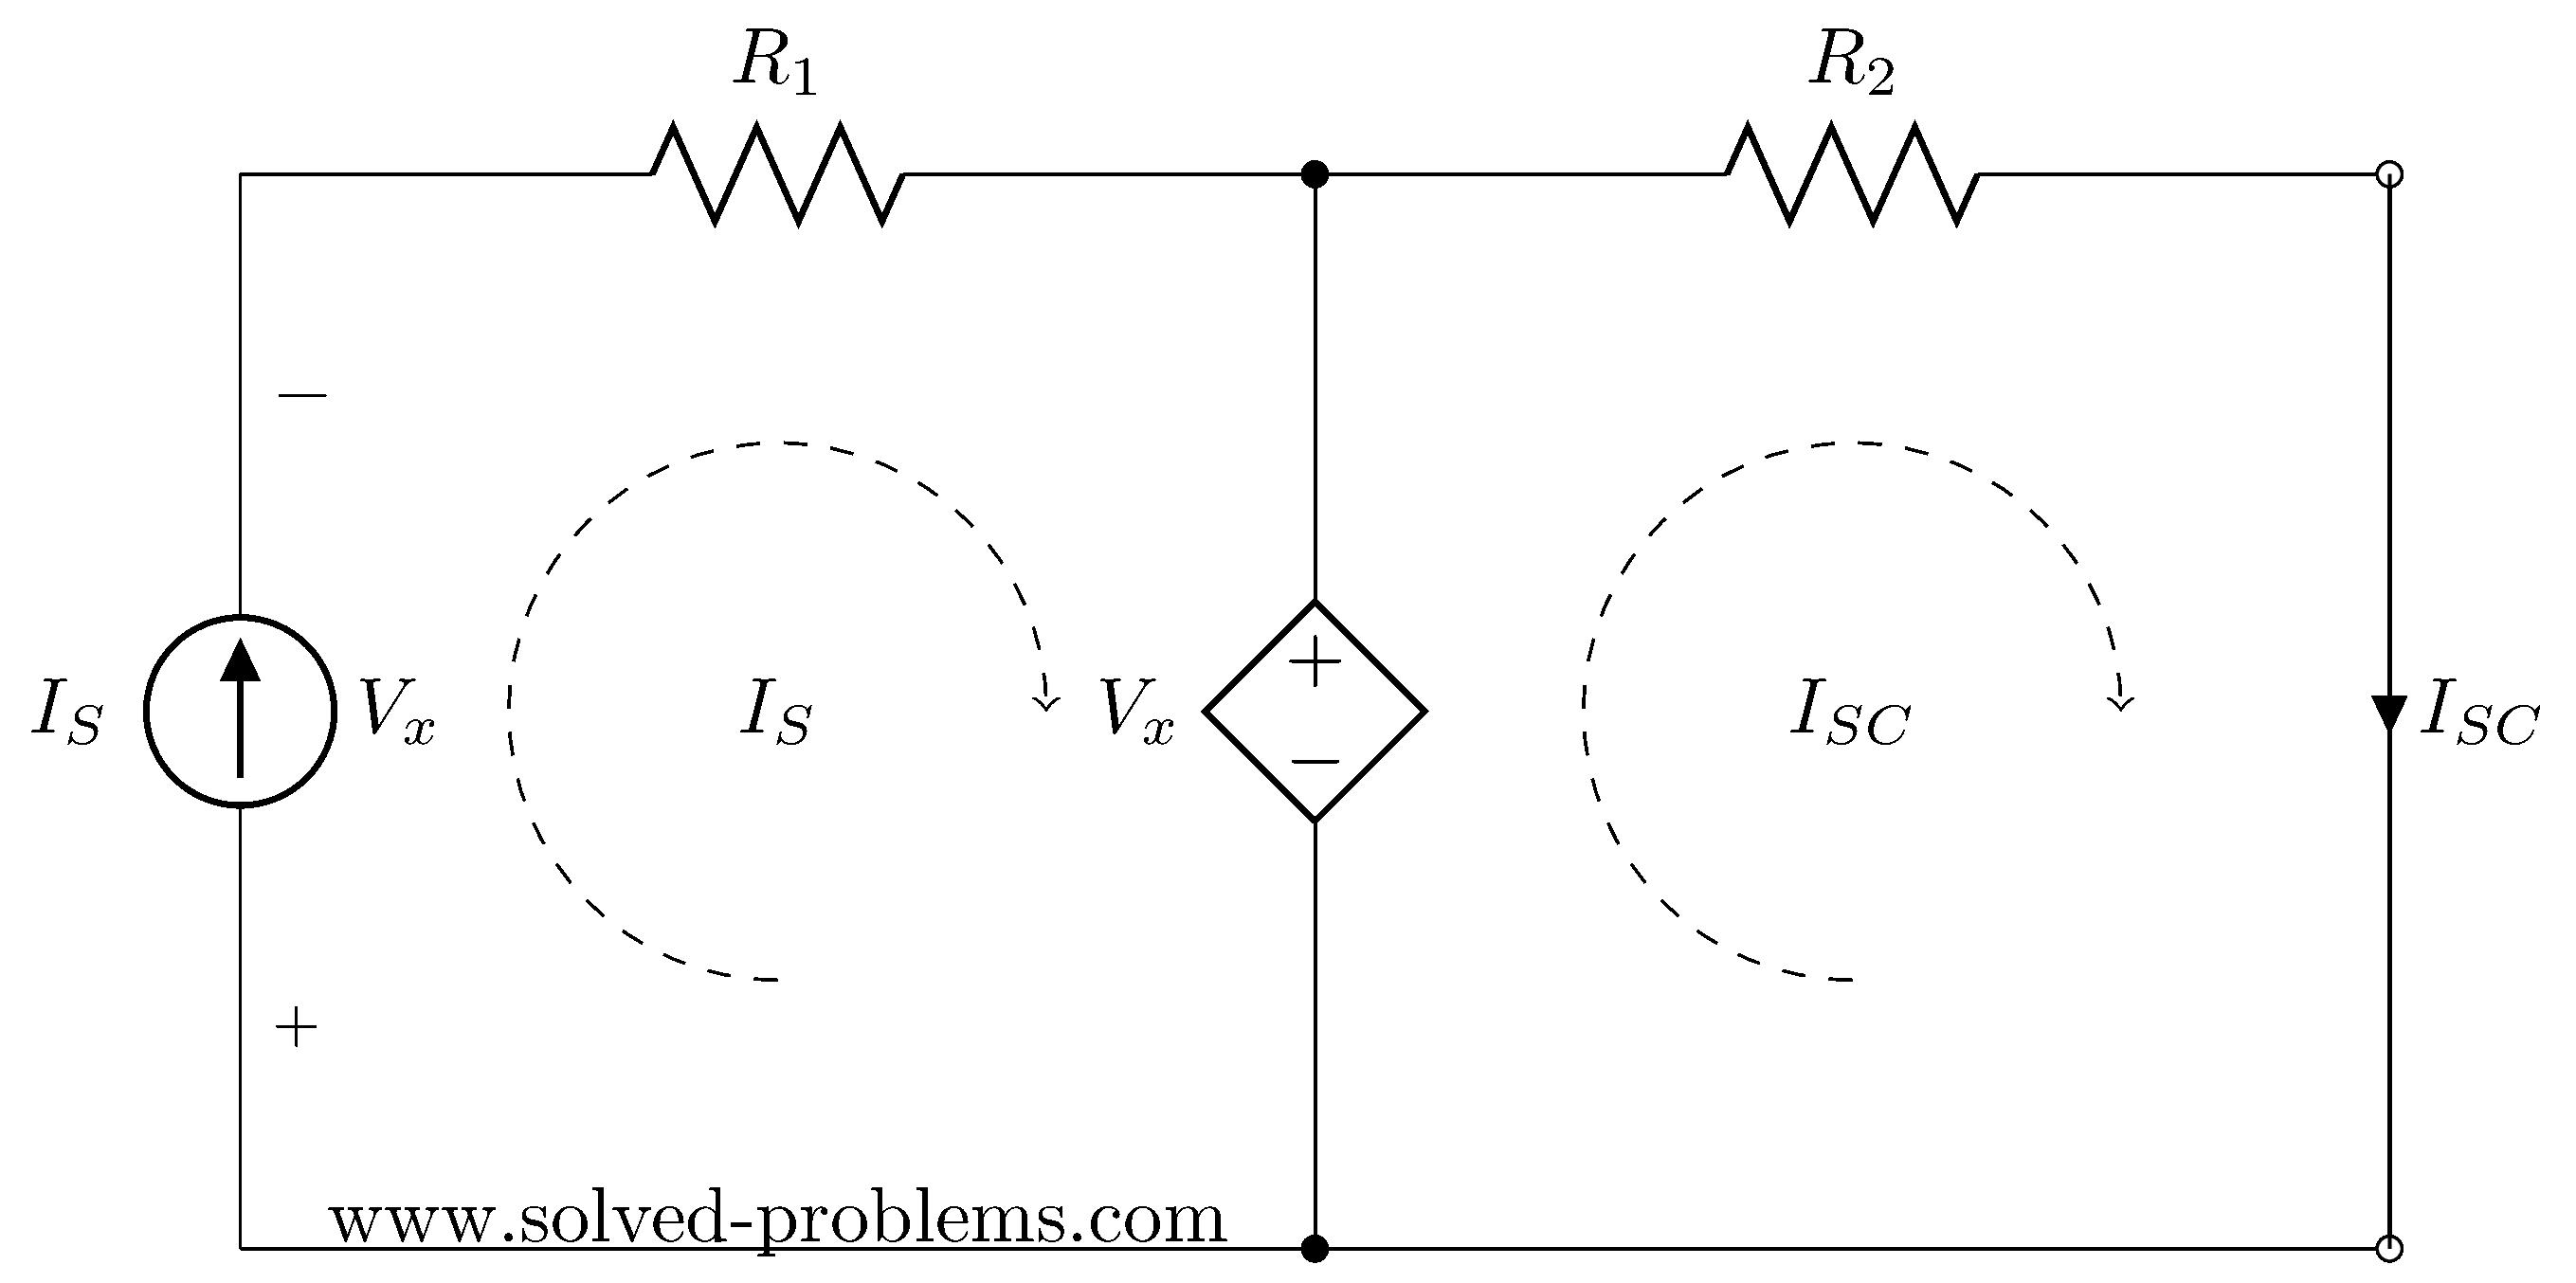 of an electrical circuit showing the wheatstone bridge circuit